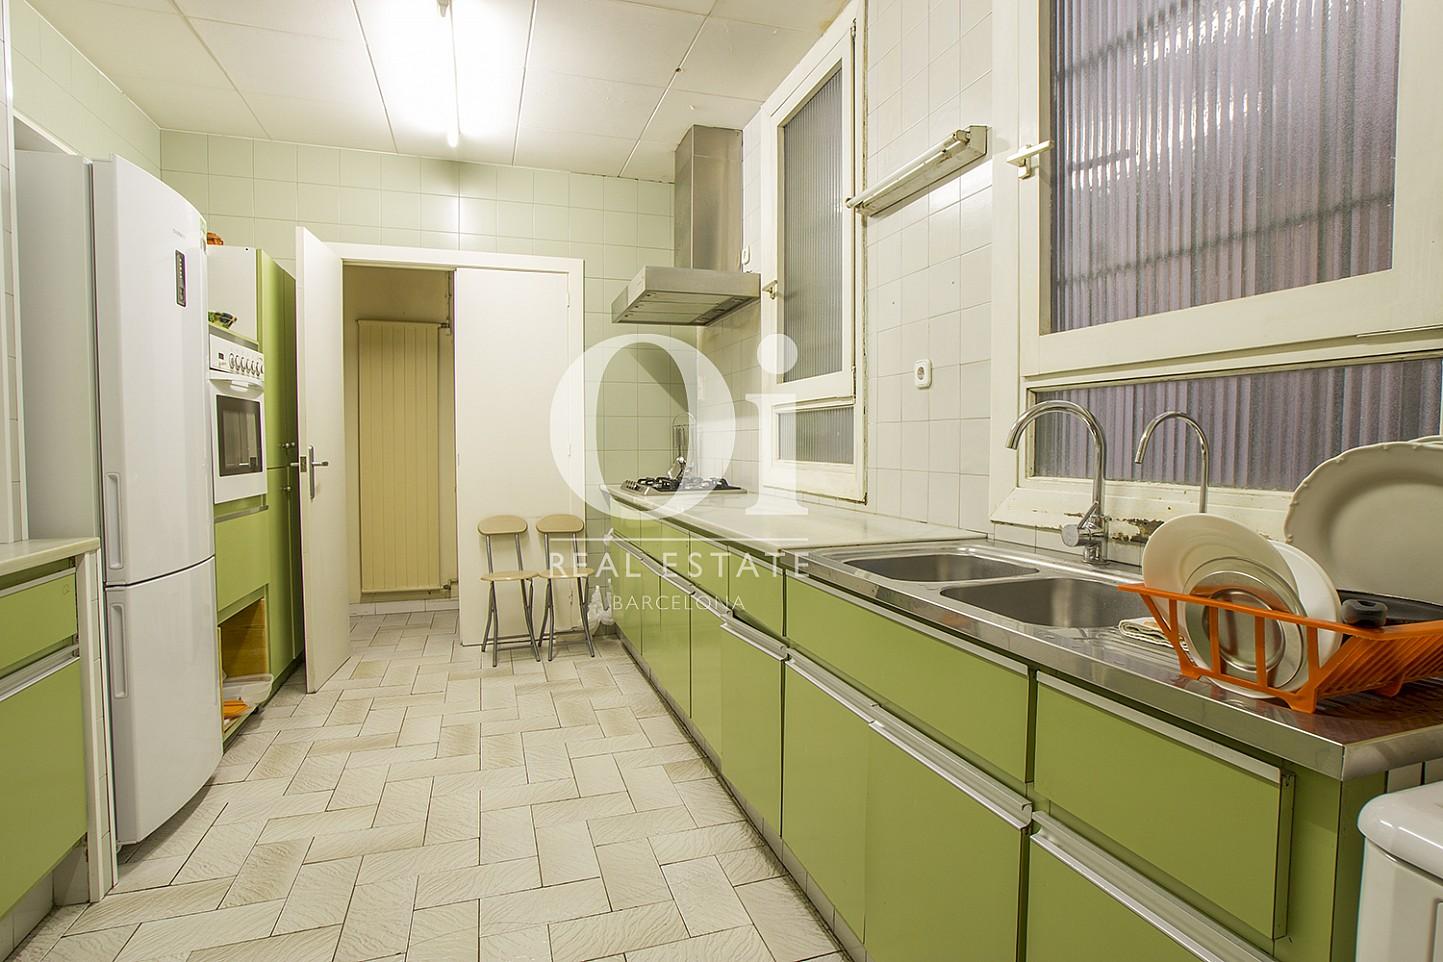 Luxury apartment for sale in Rambla Catalunya, Eixample Derecho, Barcelona